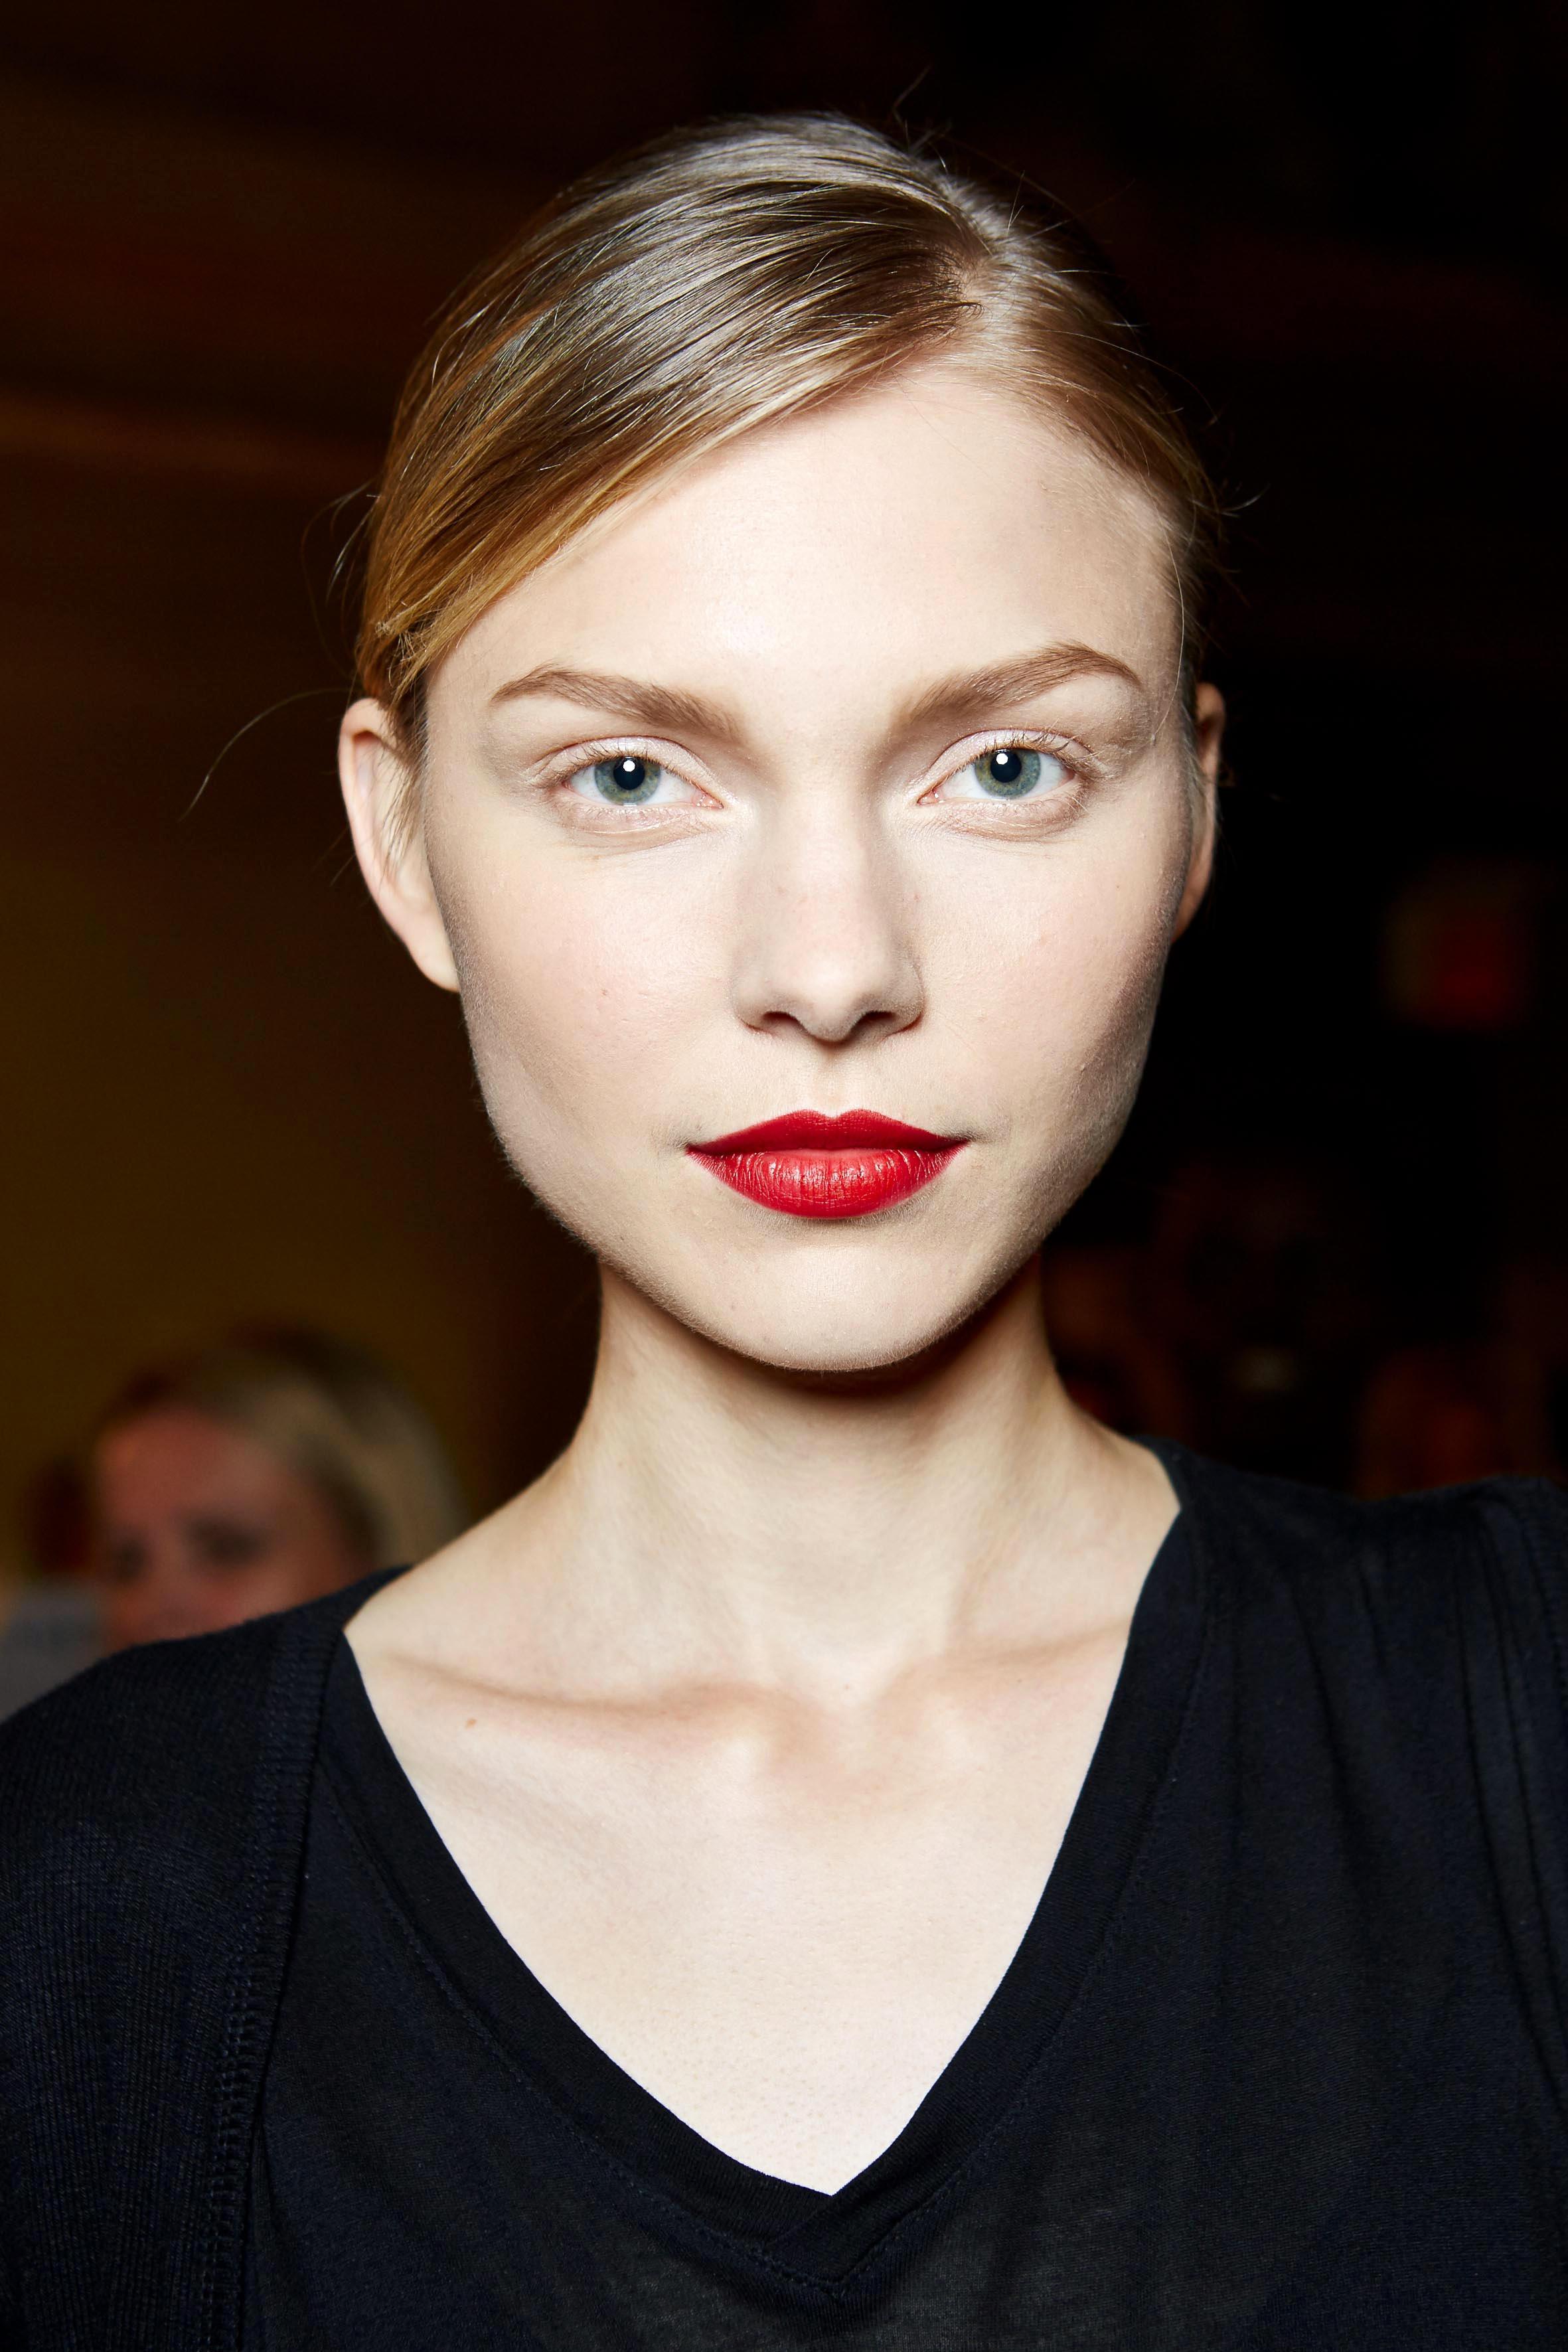 Make-up Trends 2017: Roter Lippenstift bei Zac Posen